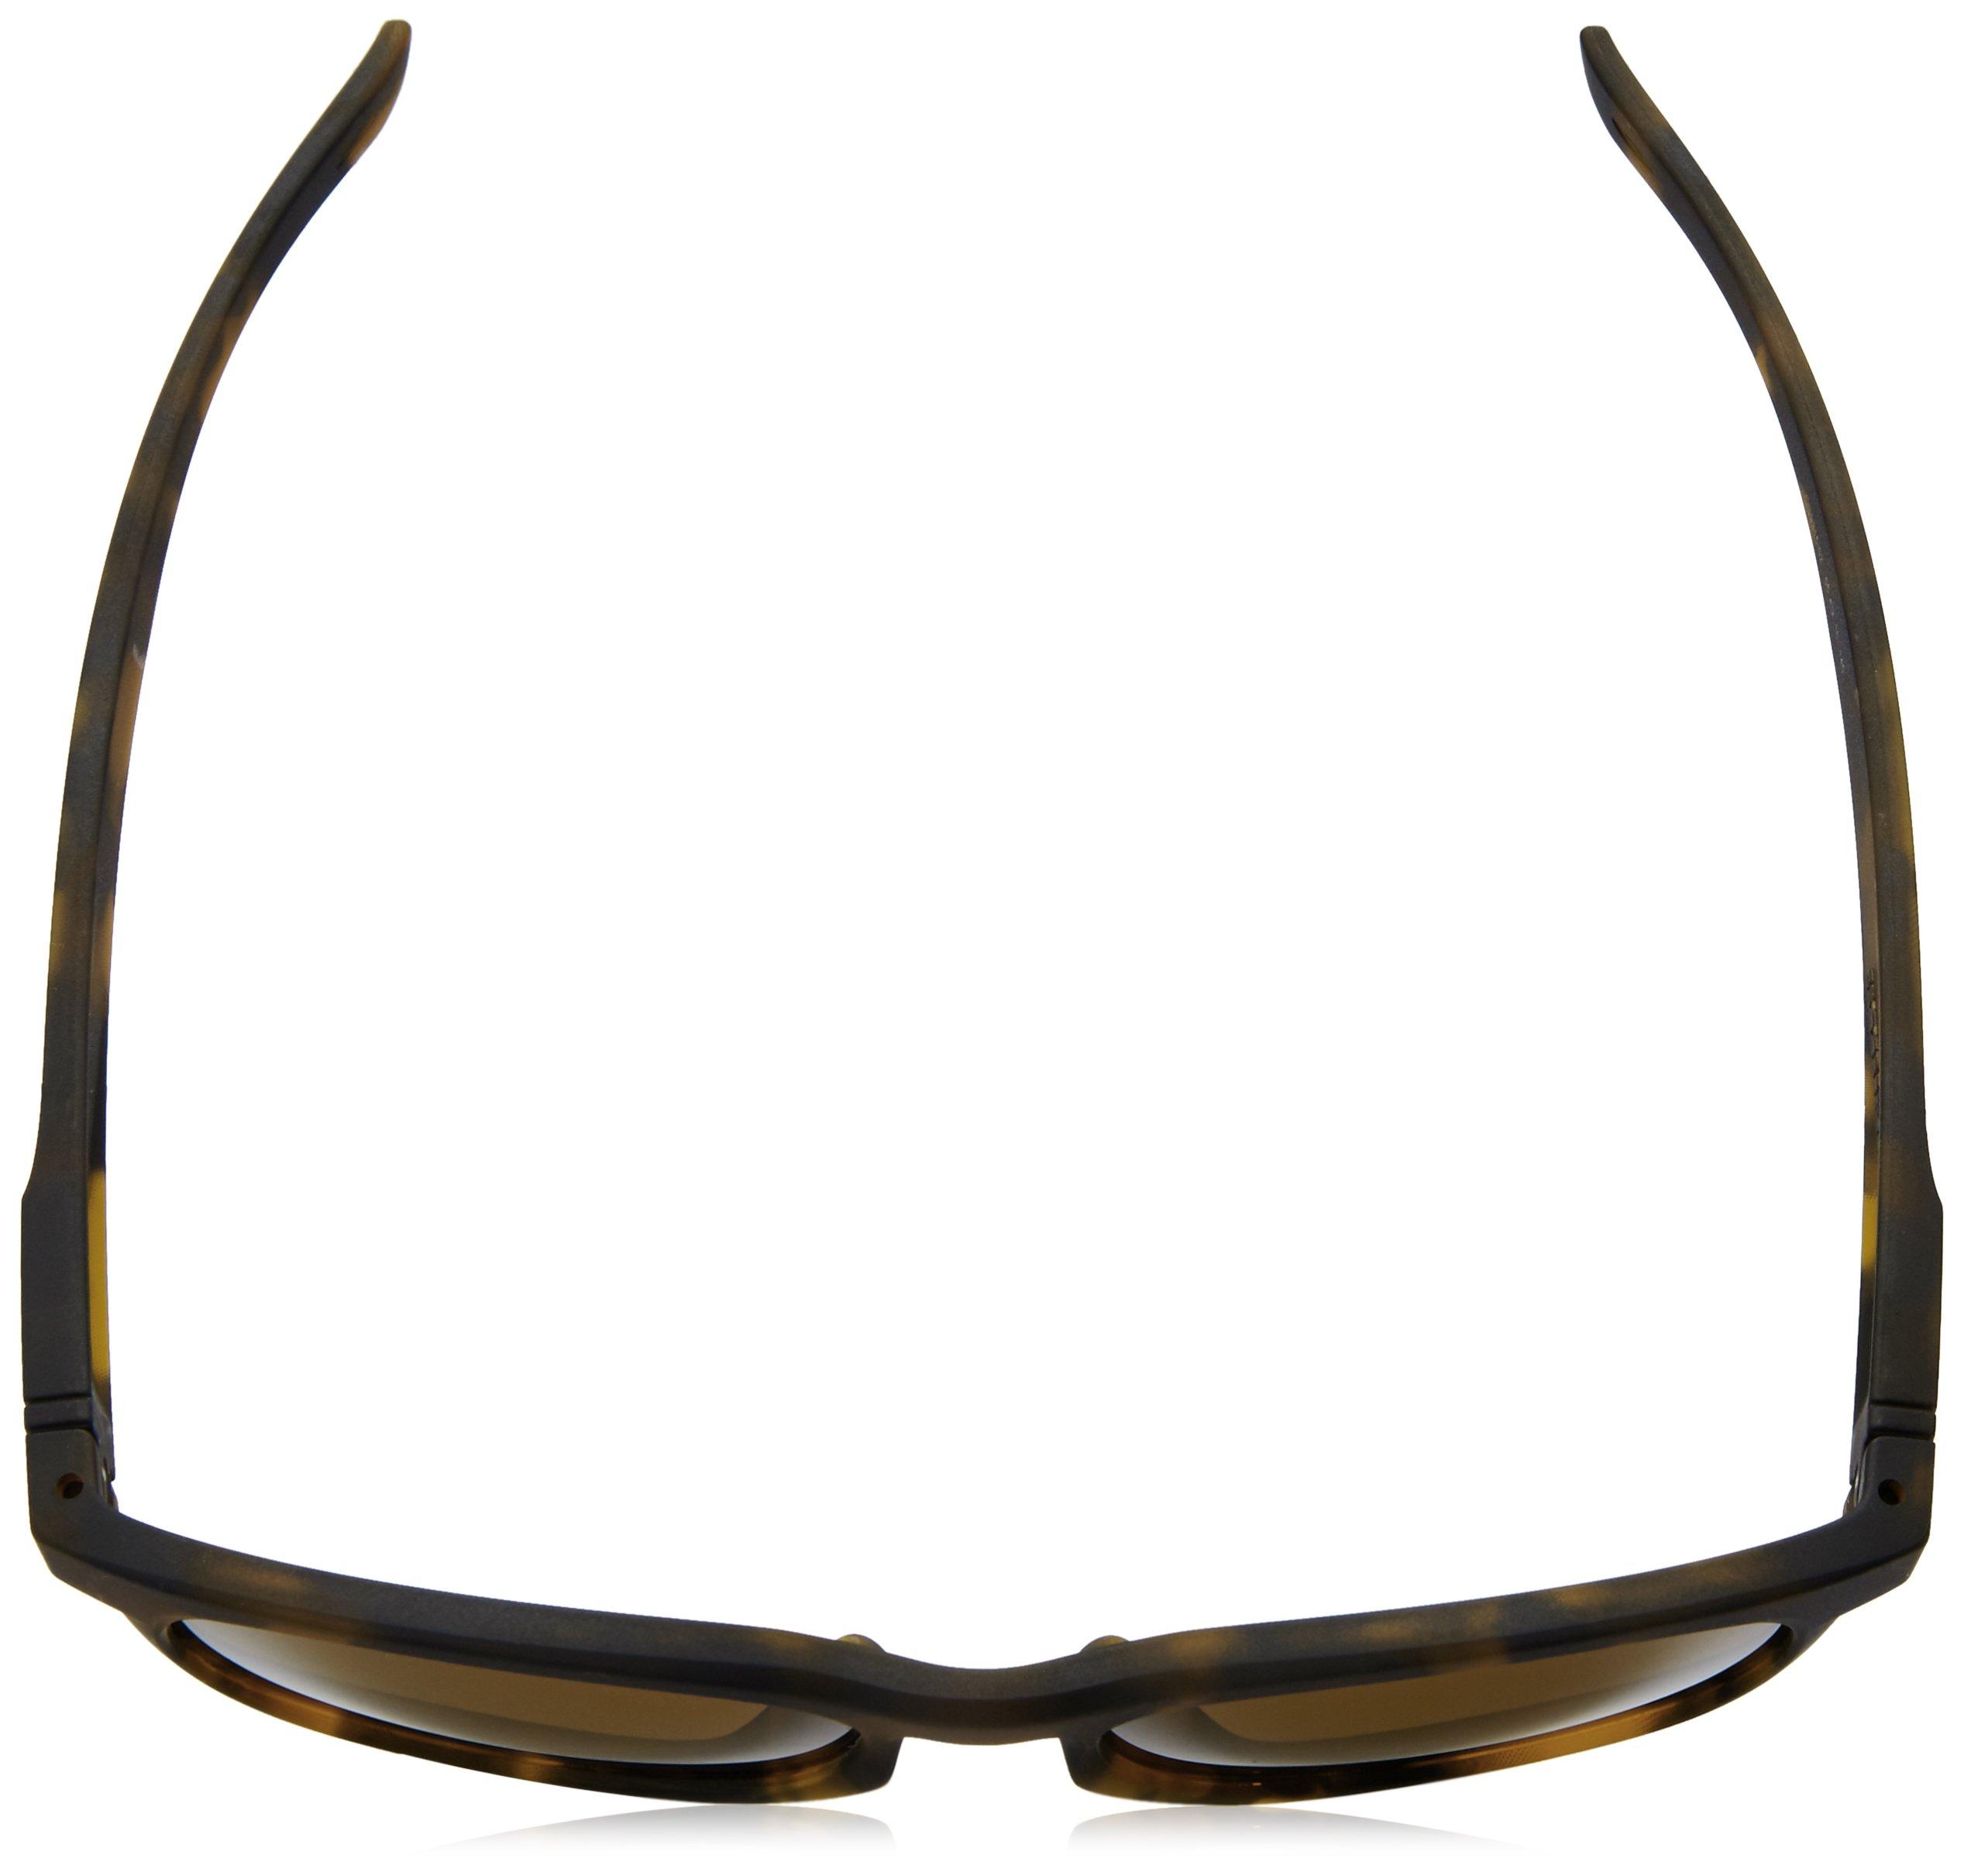 Oakley Men's Stringer Rectangular Sunglasses Matte Brown Tort w/Dark Bronze 55 mm by Oakley (Image #4)